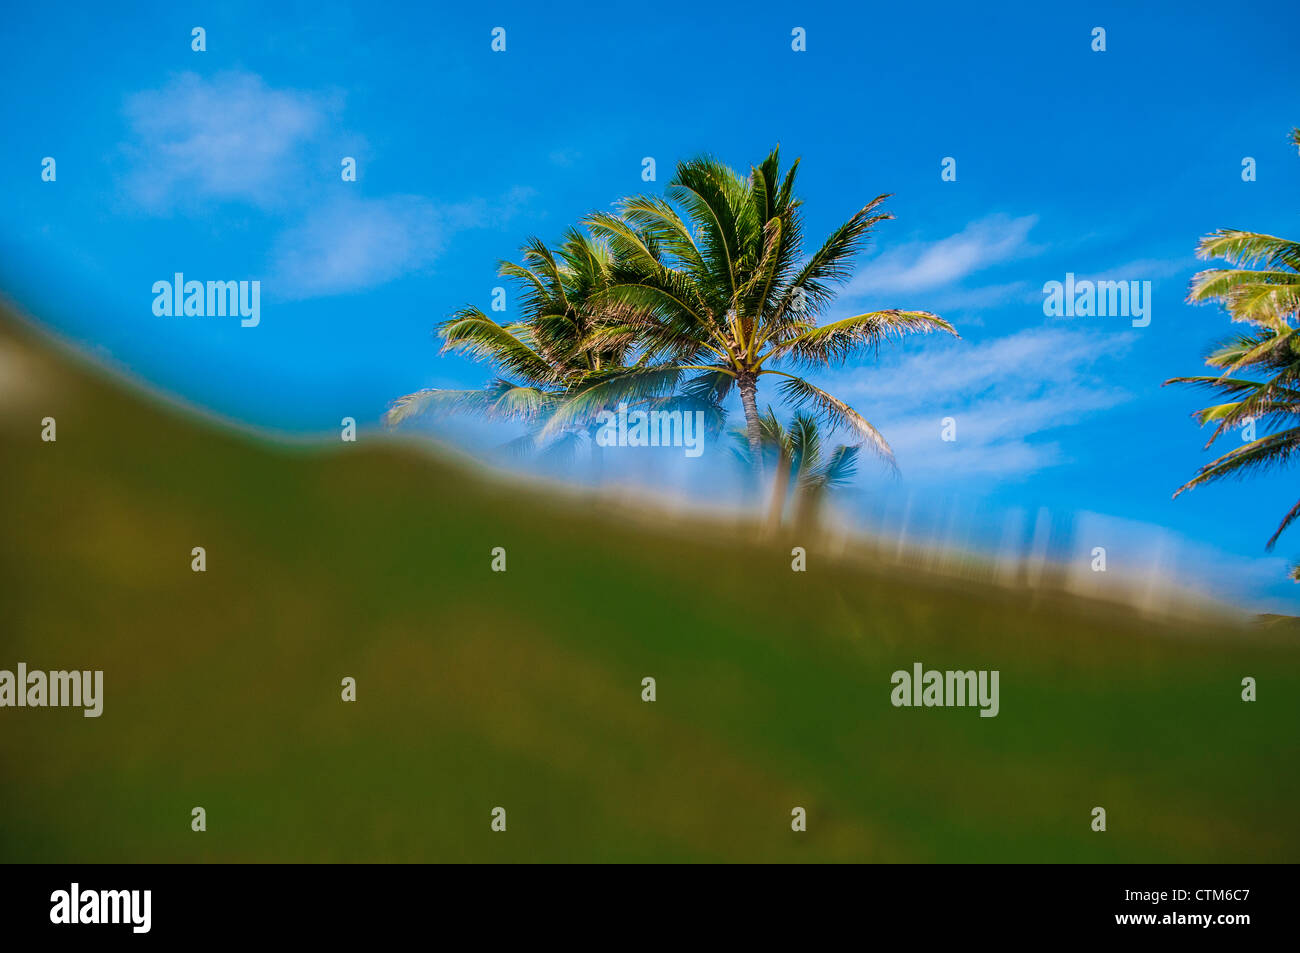 Coconut trees & sea split level view, Kailua Bay, Oahu, Hawaii - Stock Image